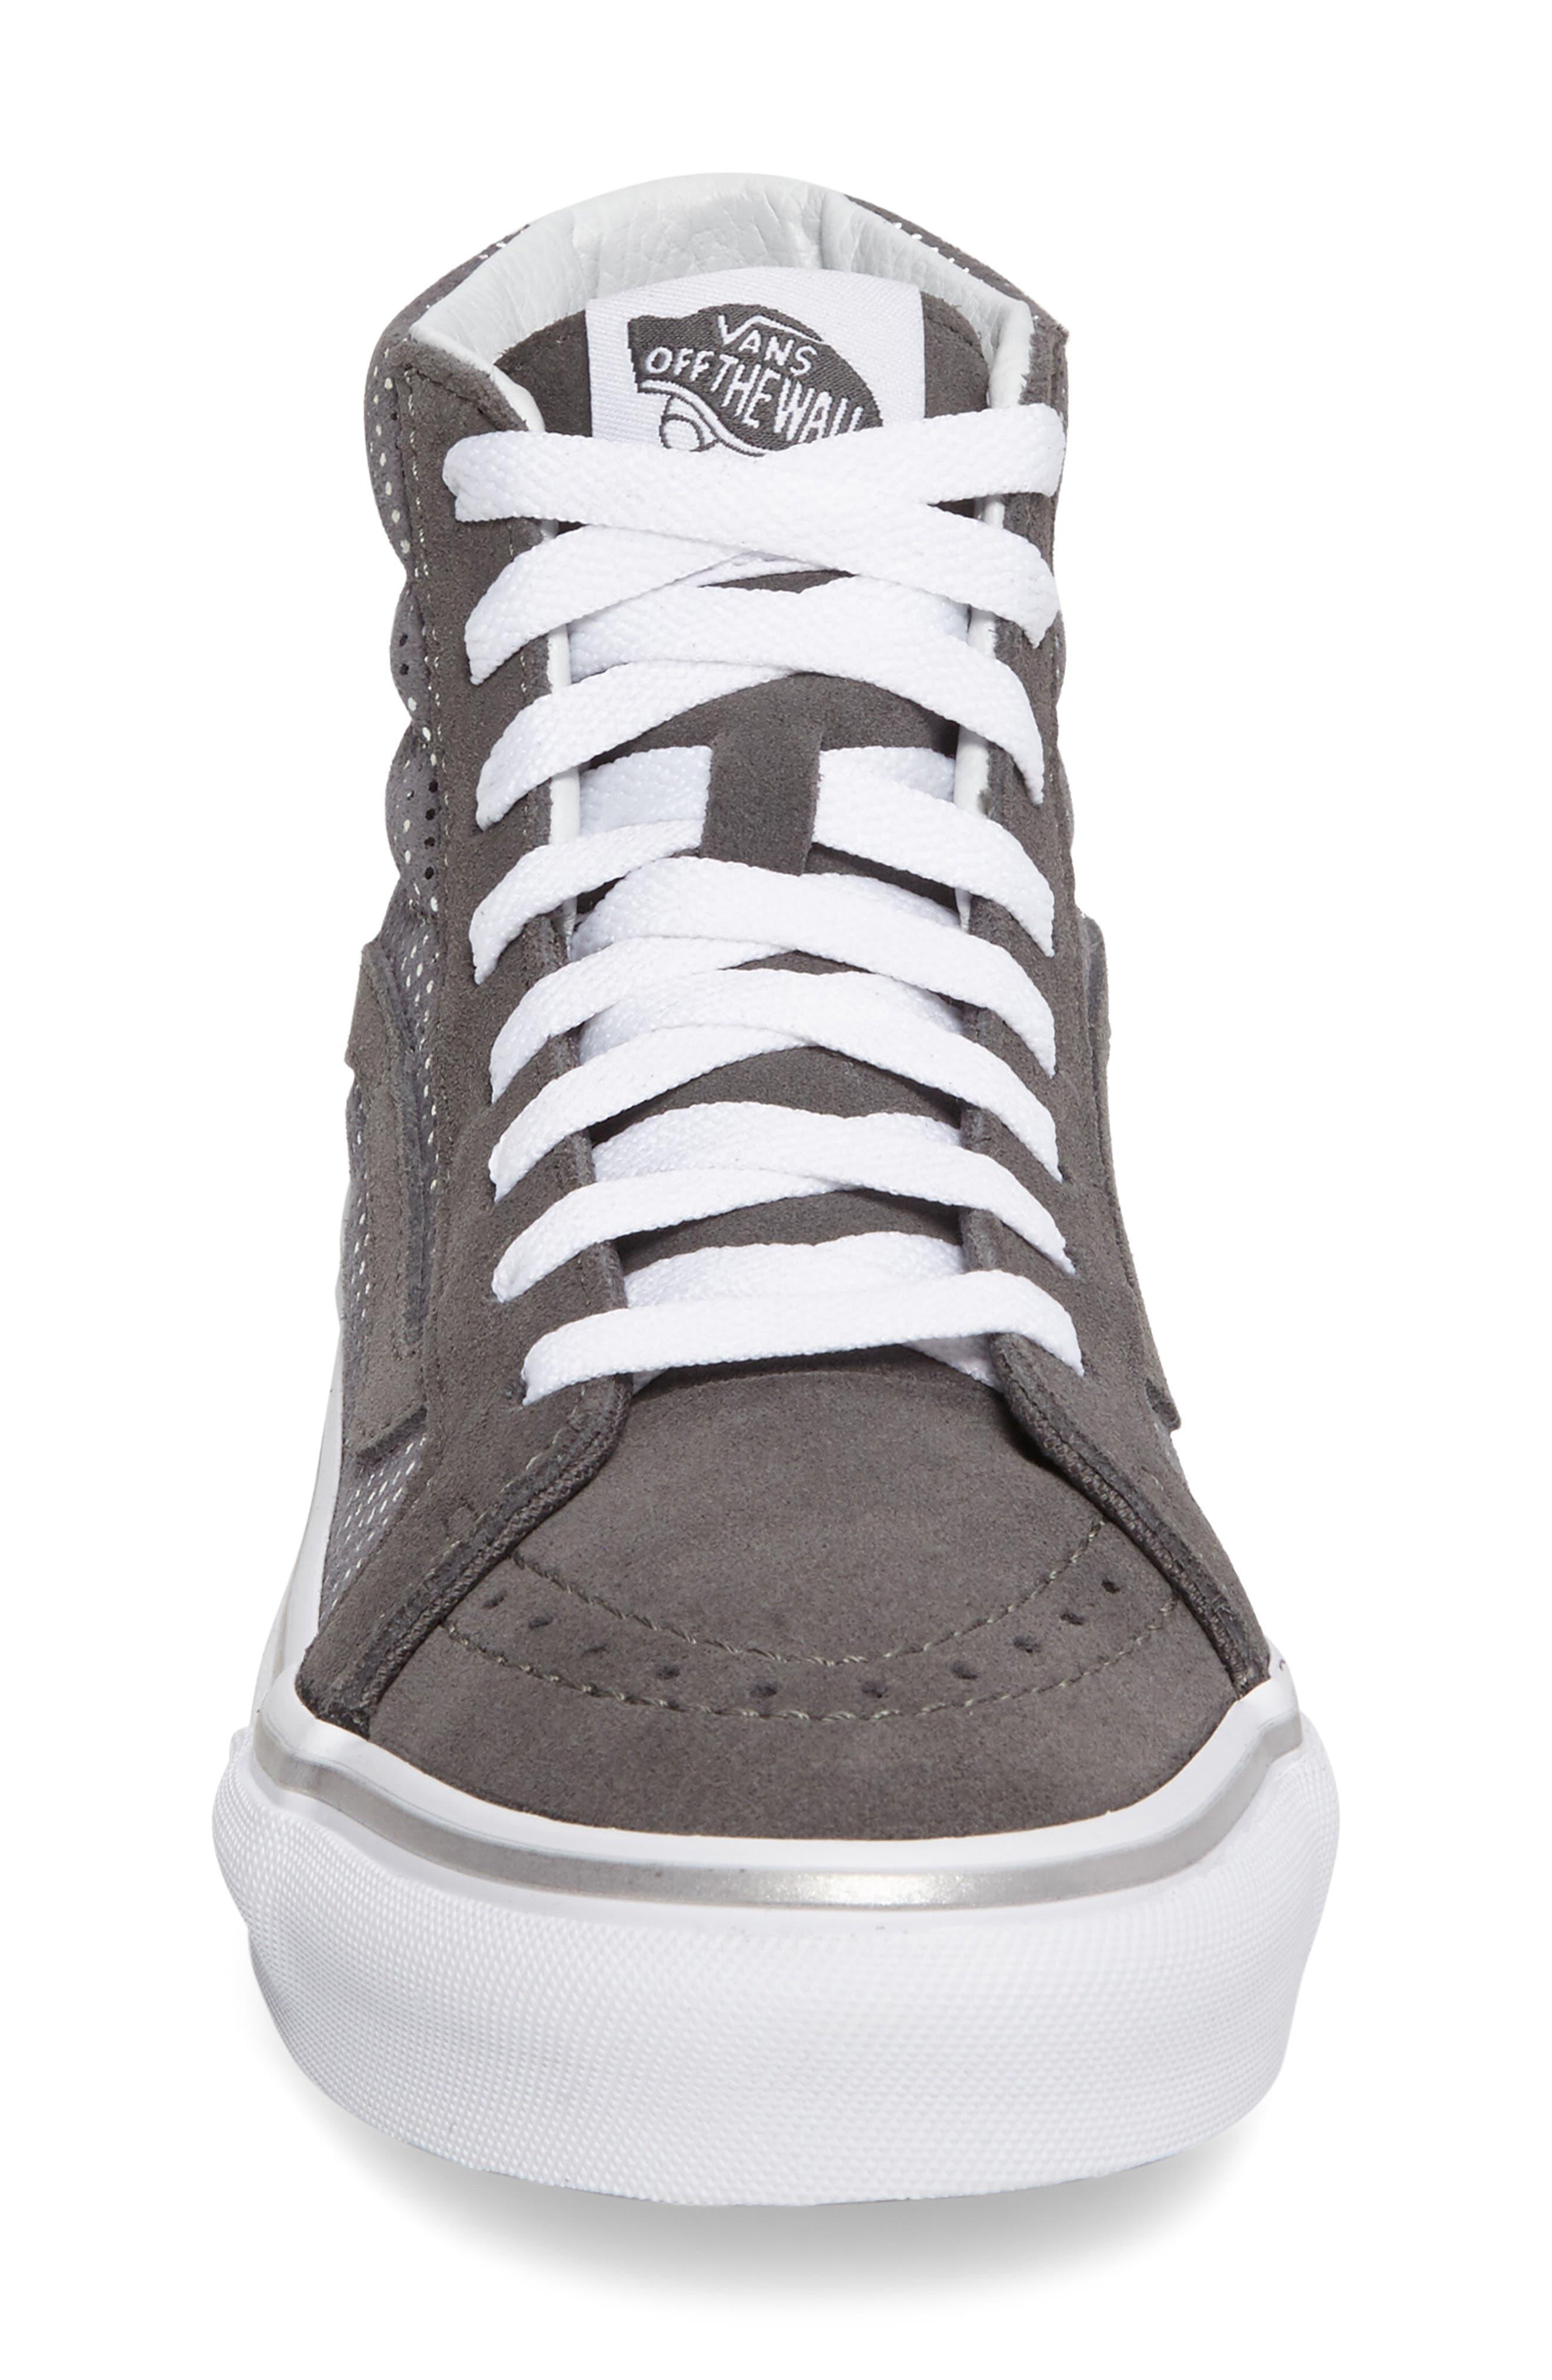 Alternate Image 3  - Vans Sk8-Hi Slim High Top Sneaker (Women)